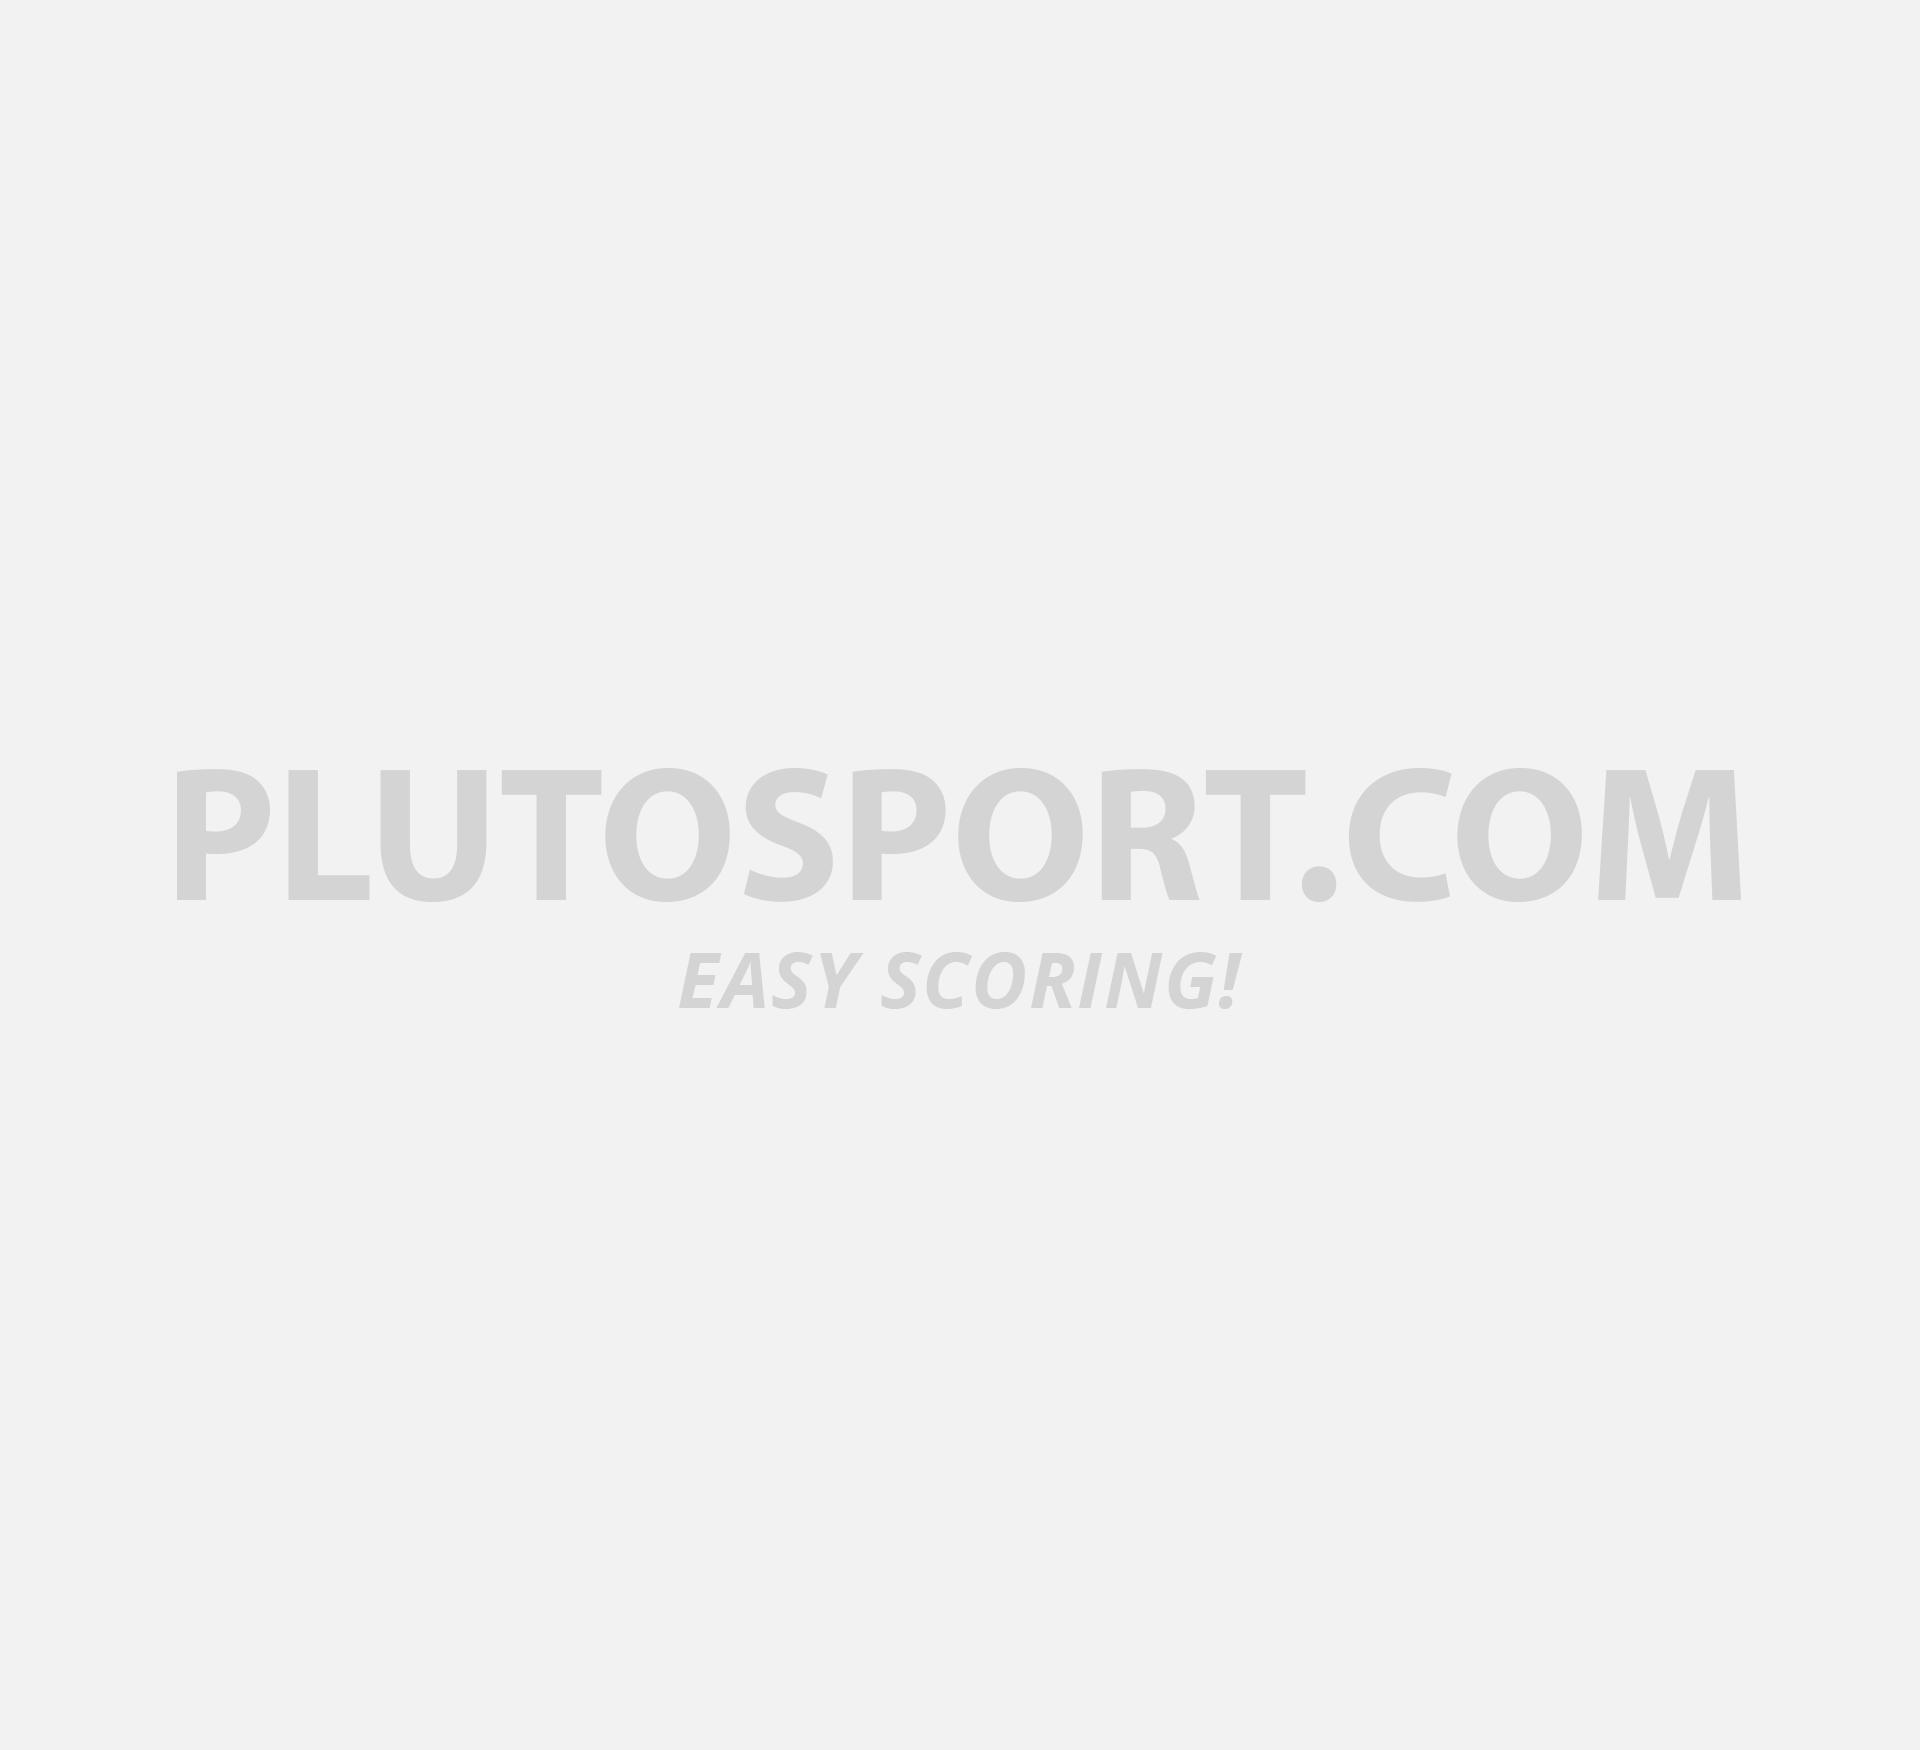 8e169e3fc303 Nike Benassi Swoosh - Bath slippers - Slippers - Shoes - Lifestyle - Sports